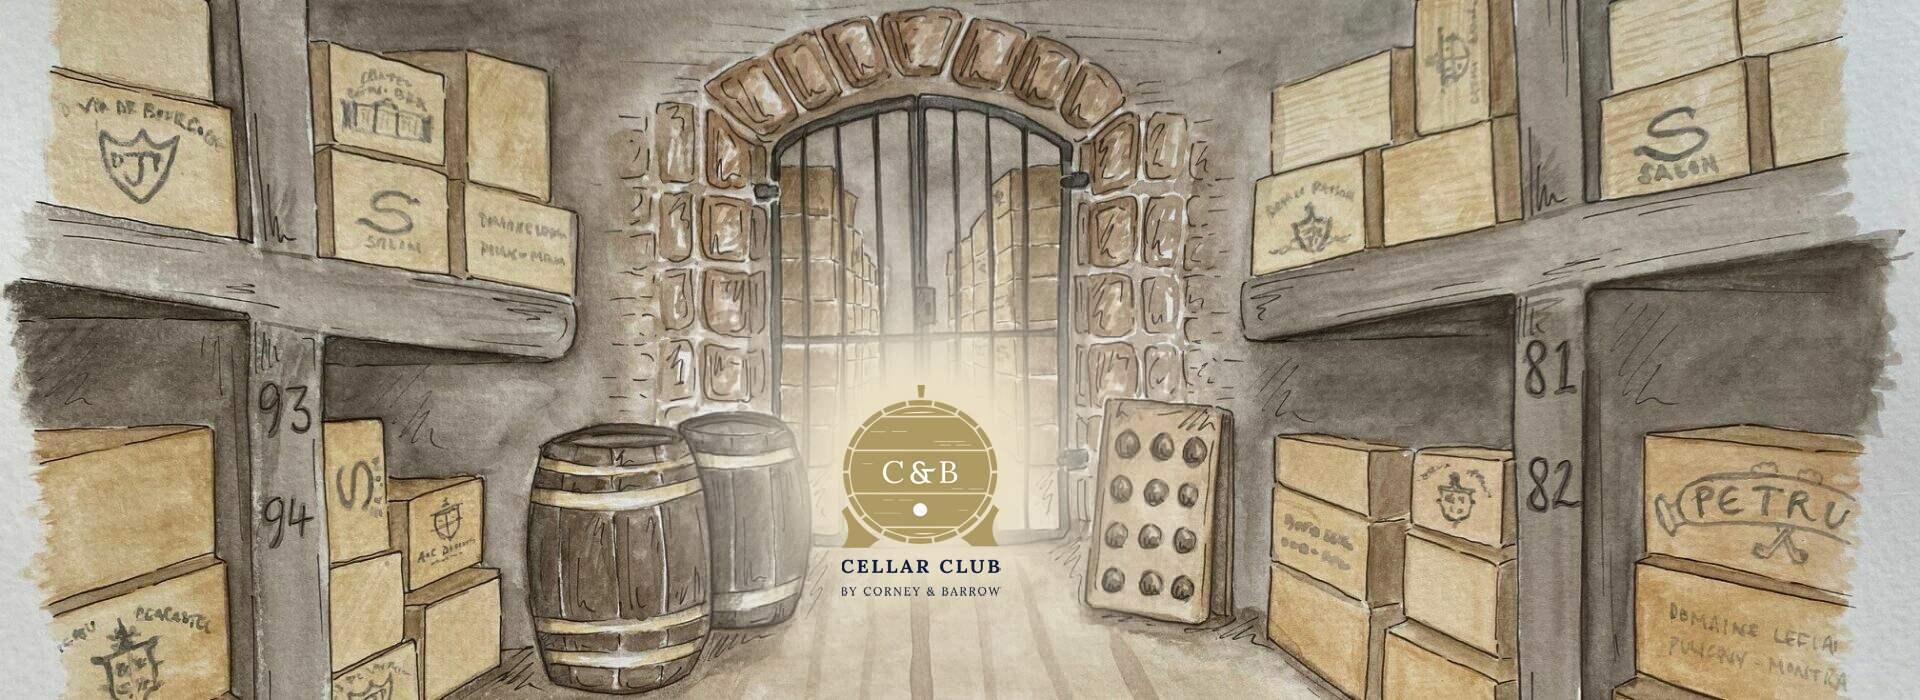 wine cellar club, wine investing, wine cellaring